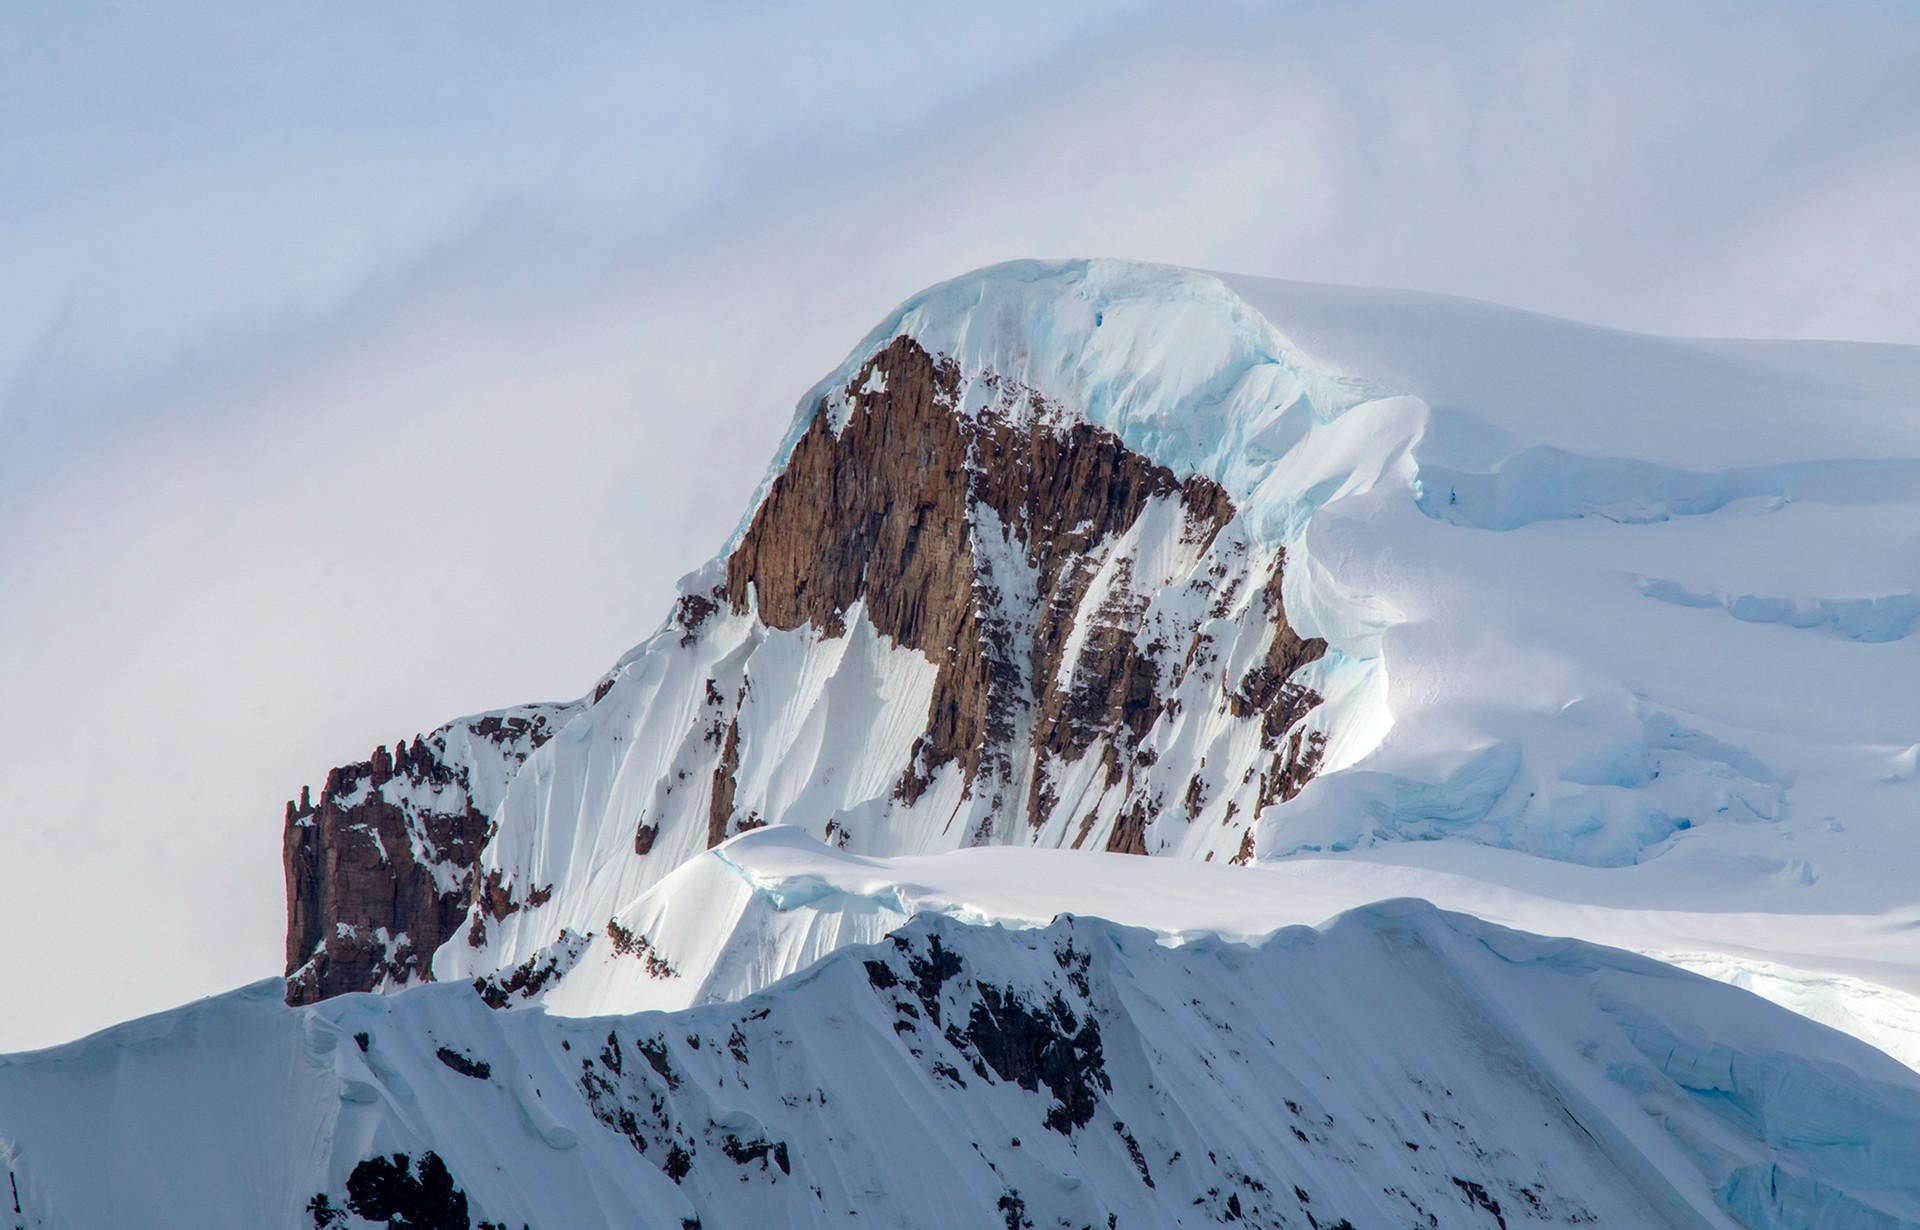 Antarctica Mountain I